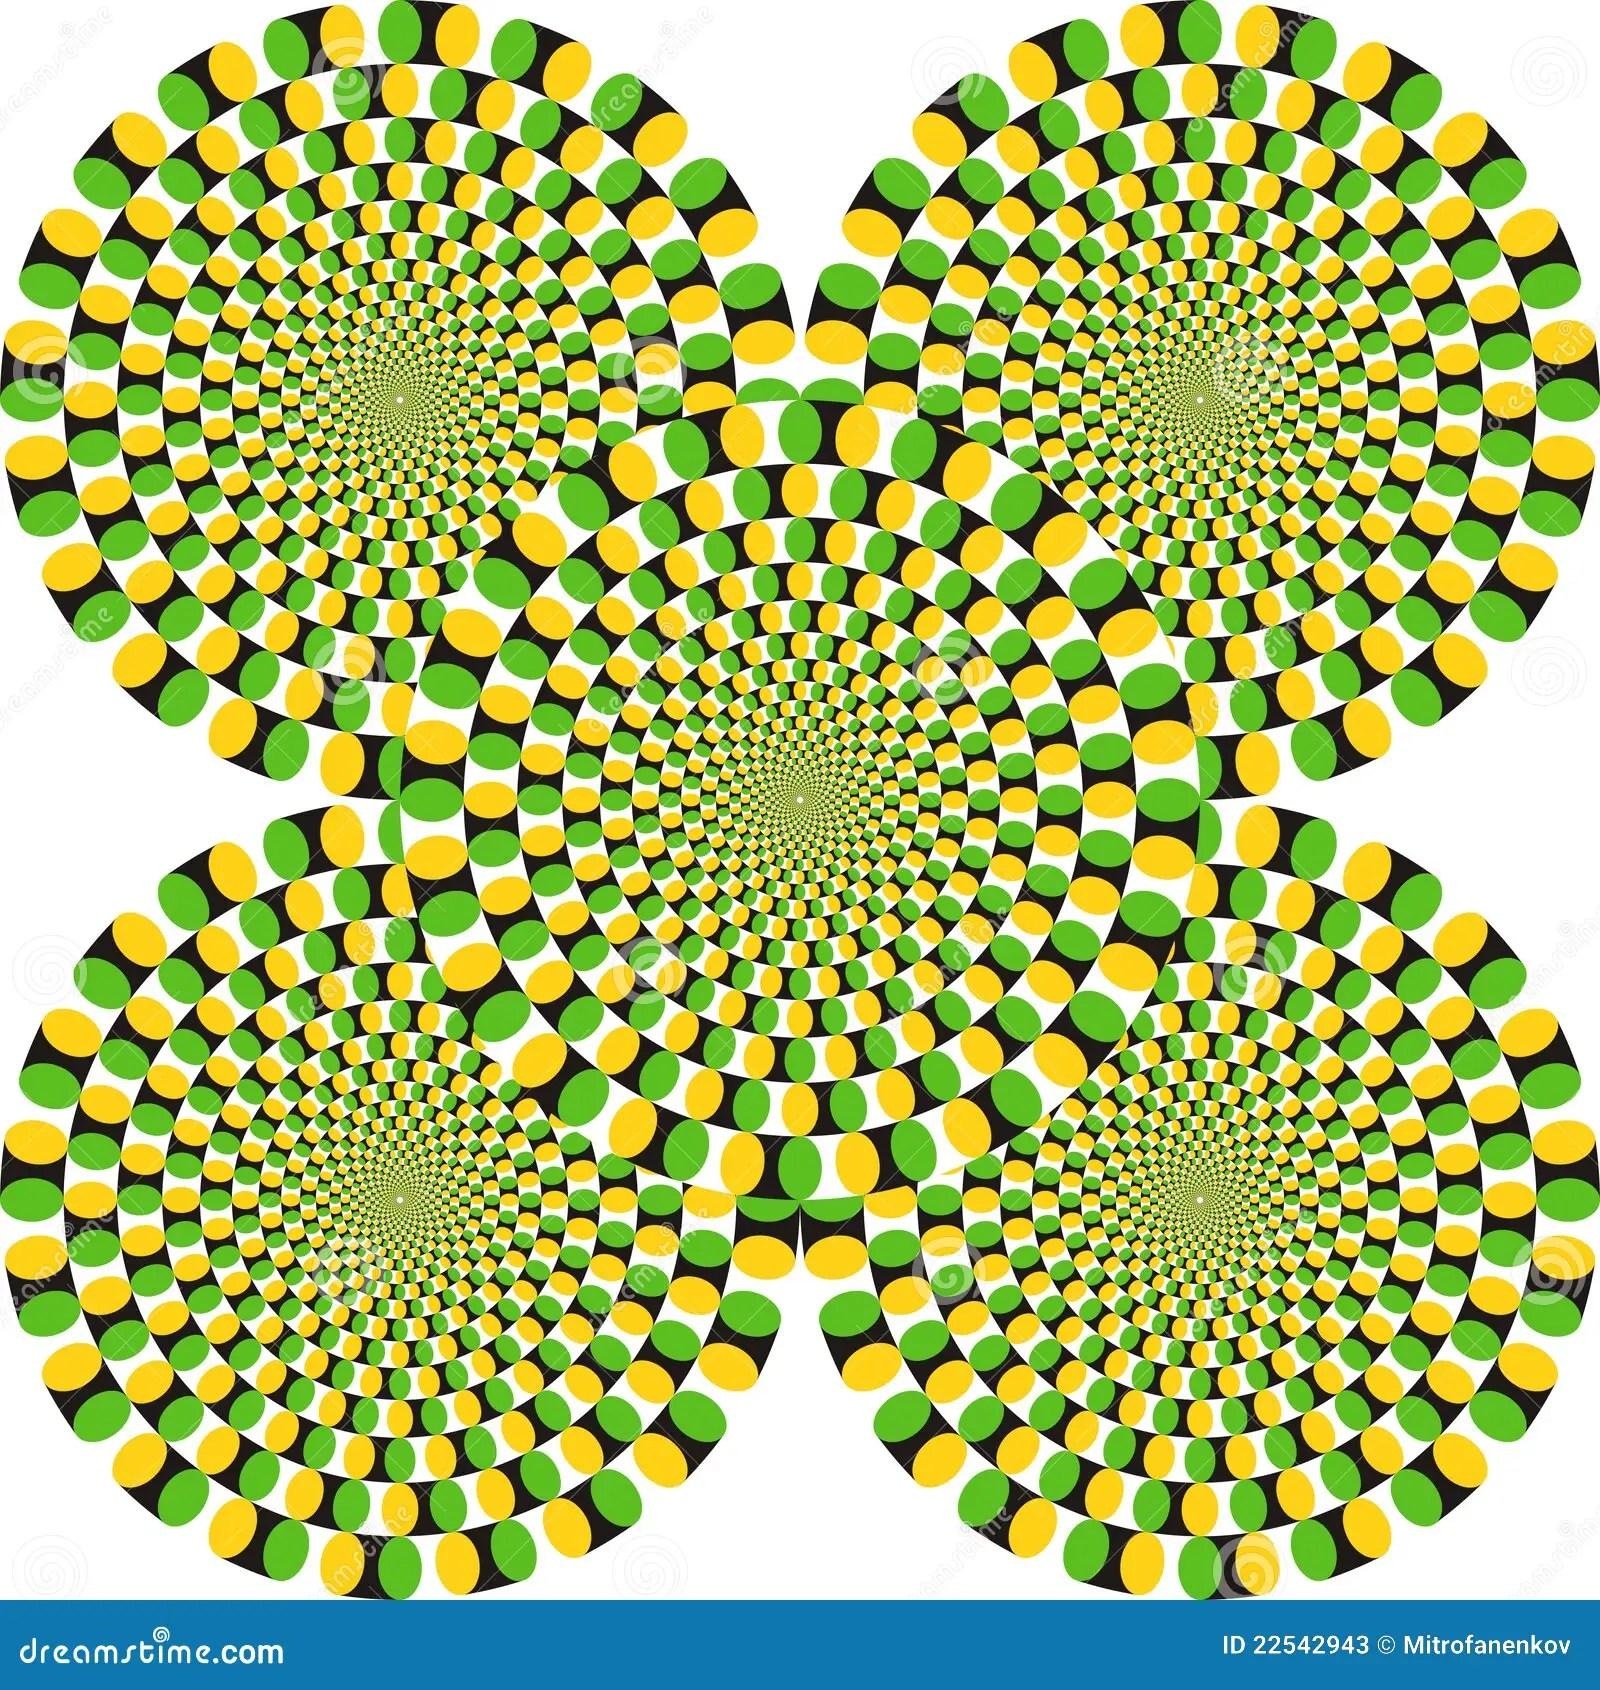 3d Snake Wallpaper Hd Spin Wheel Stock Photos Image 22542943